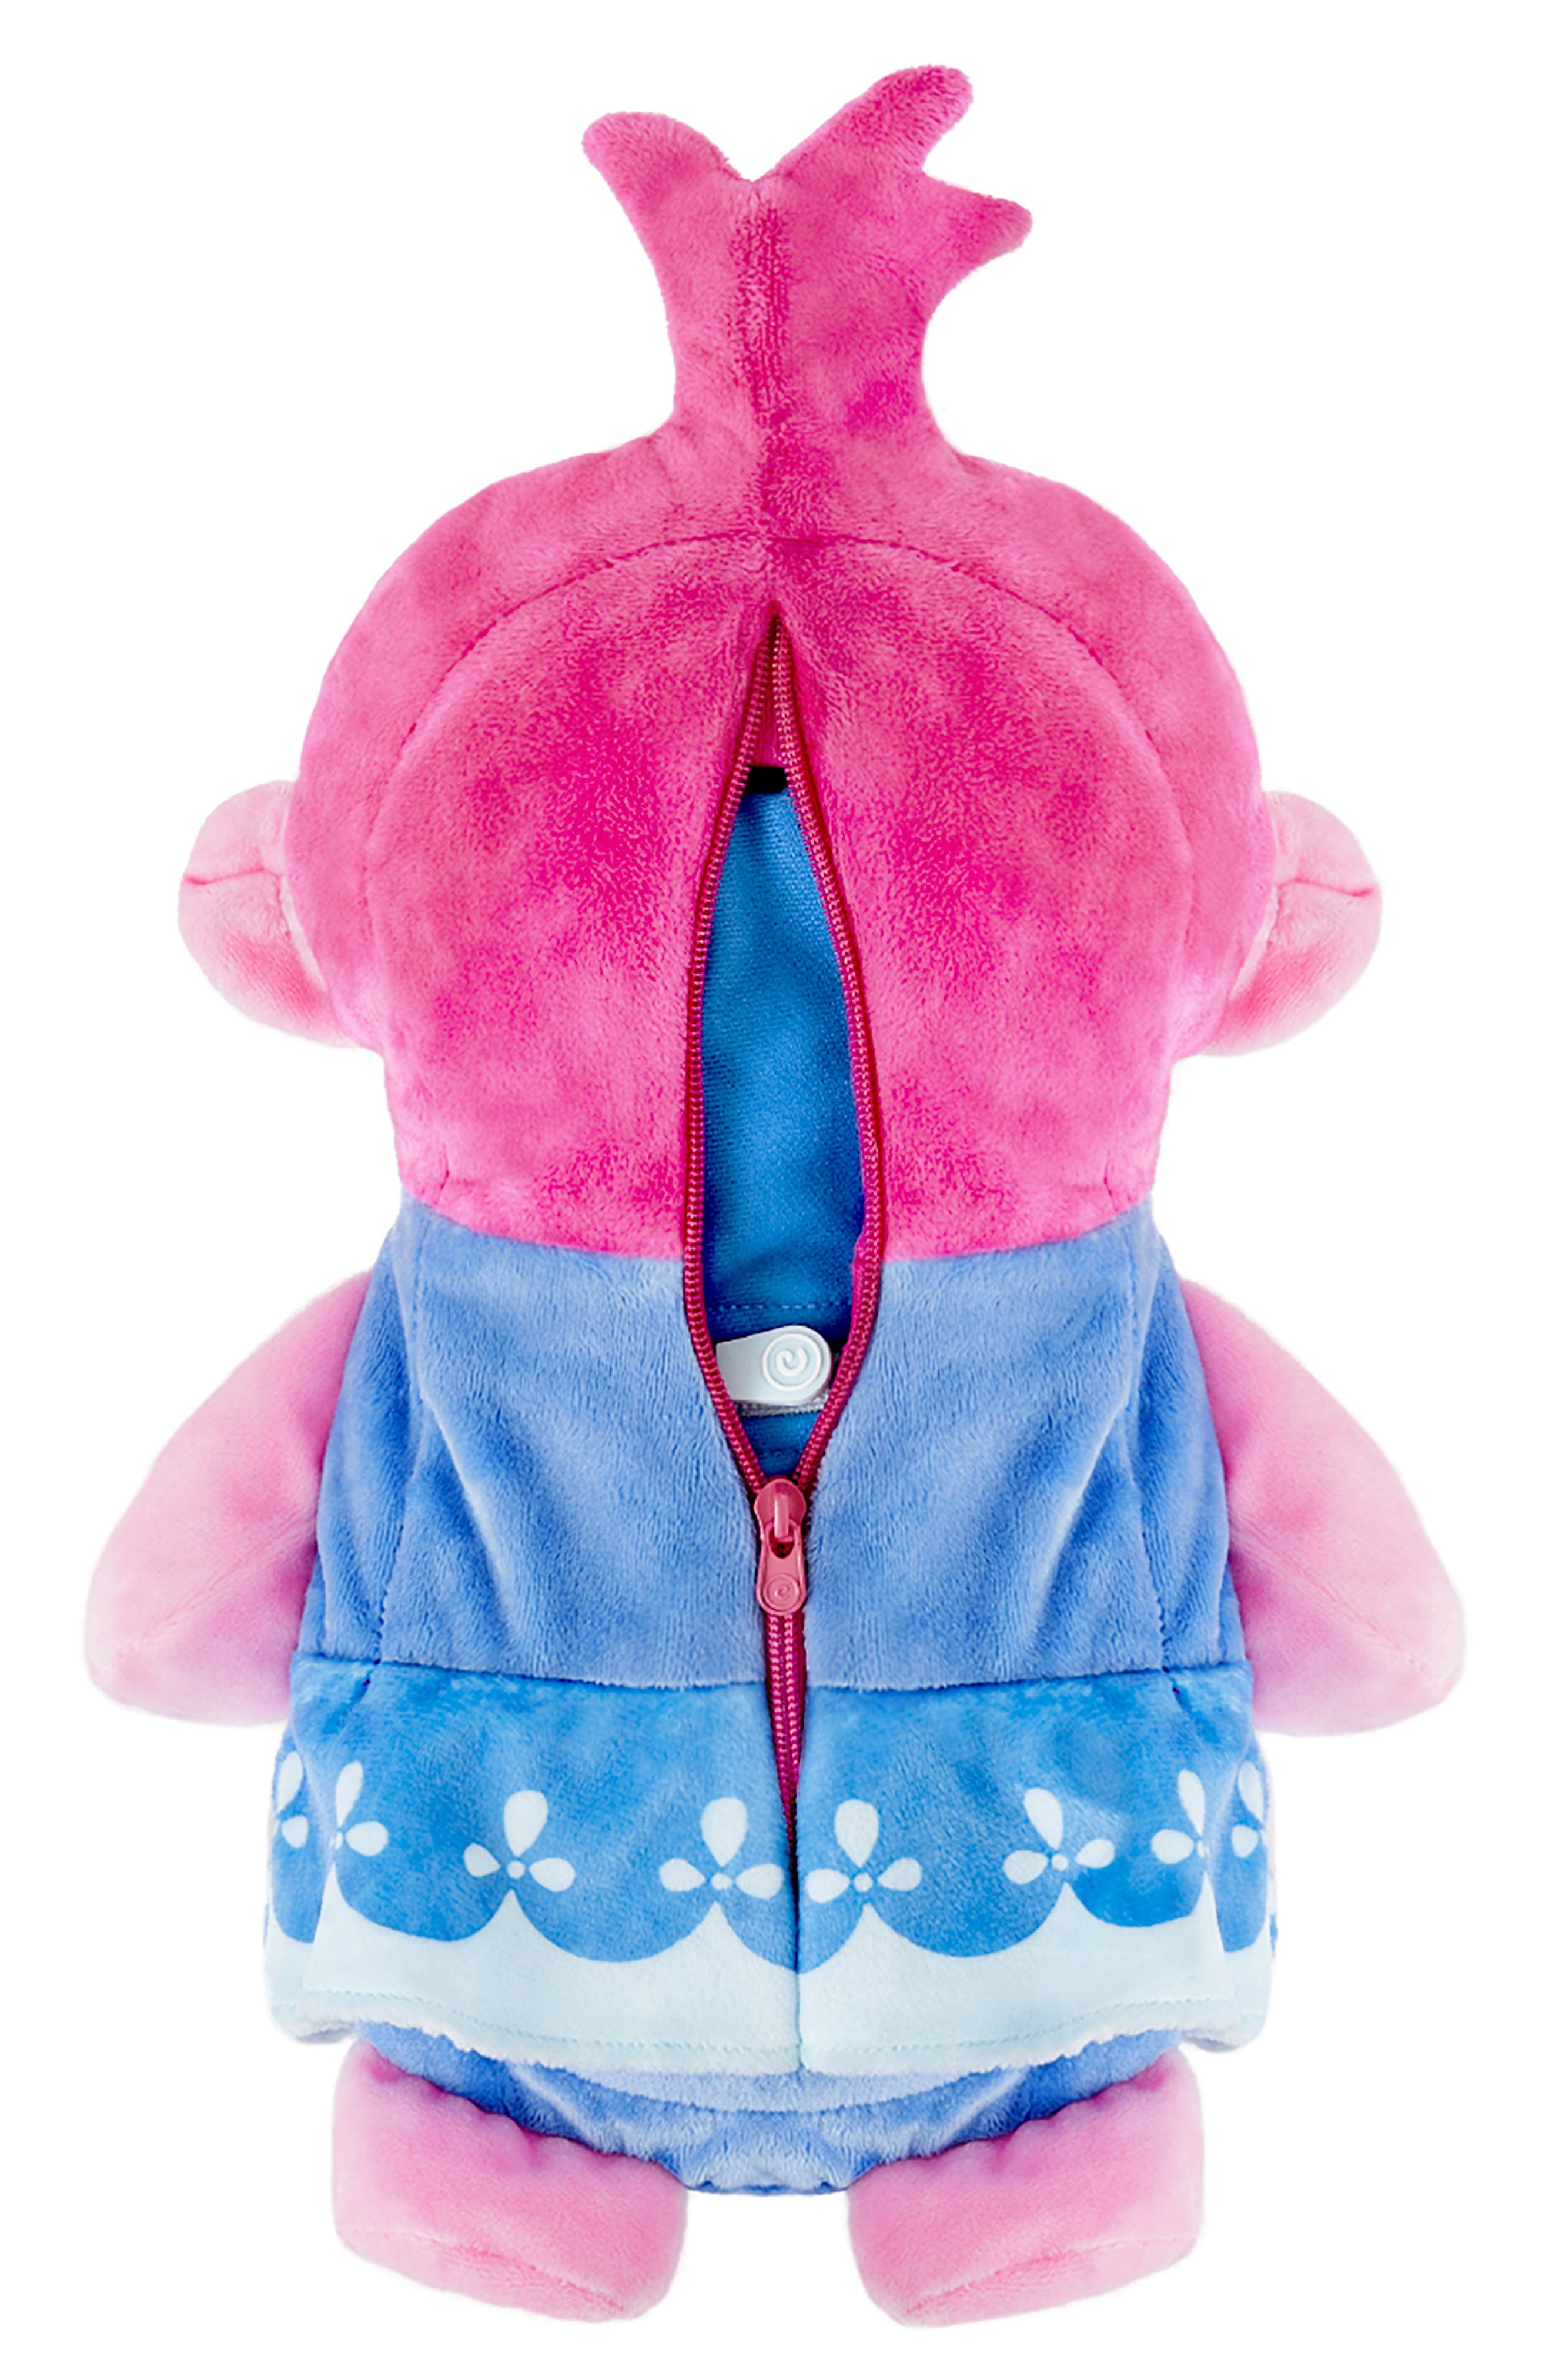 DreamWorks Trolls Poppy 2-in-1 Stuffed Animal Hoodie,                             Alternate thumbnail 6, color,                             PINK MIX